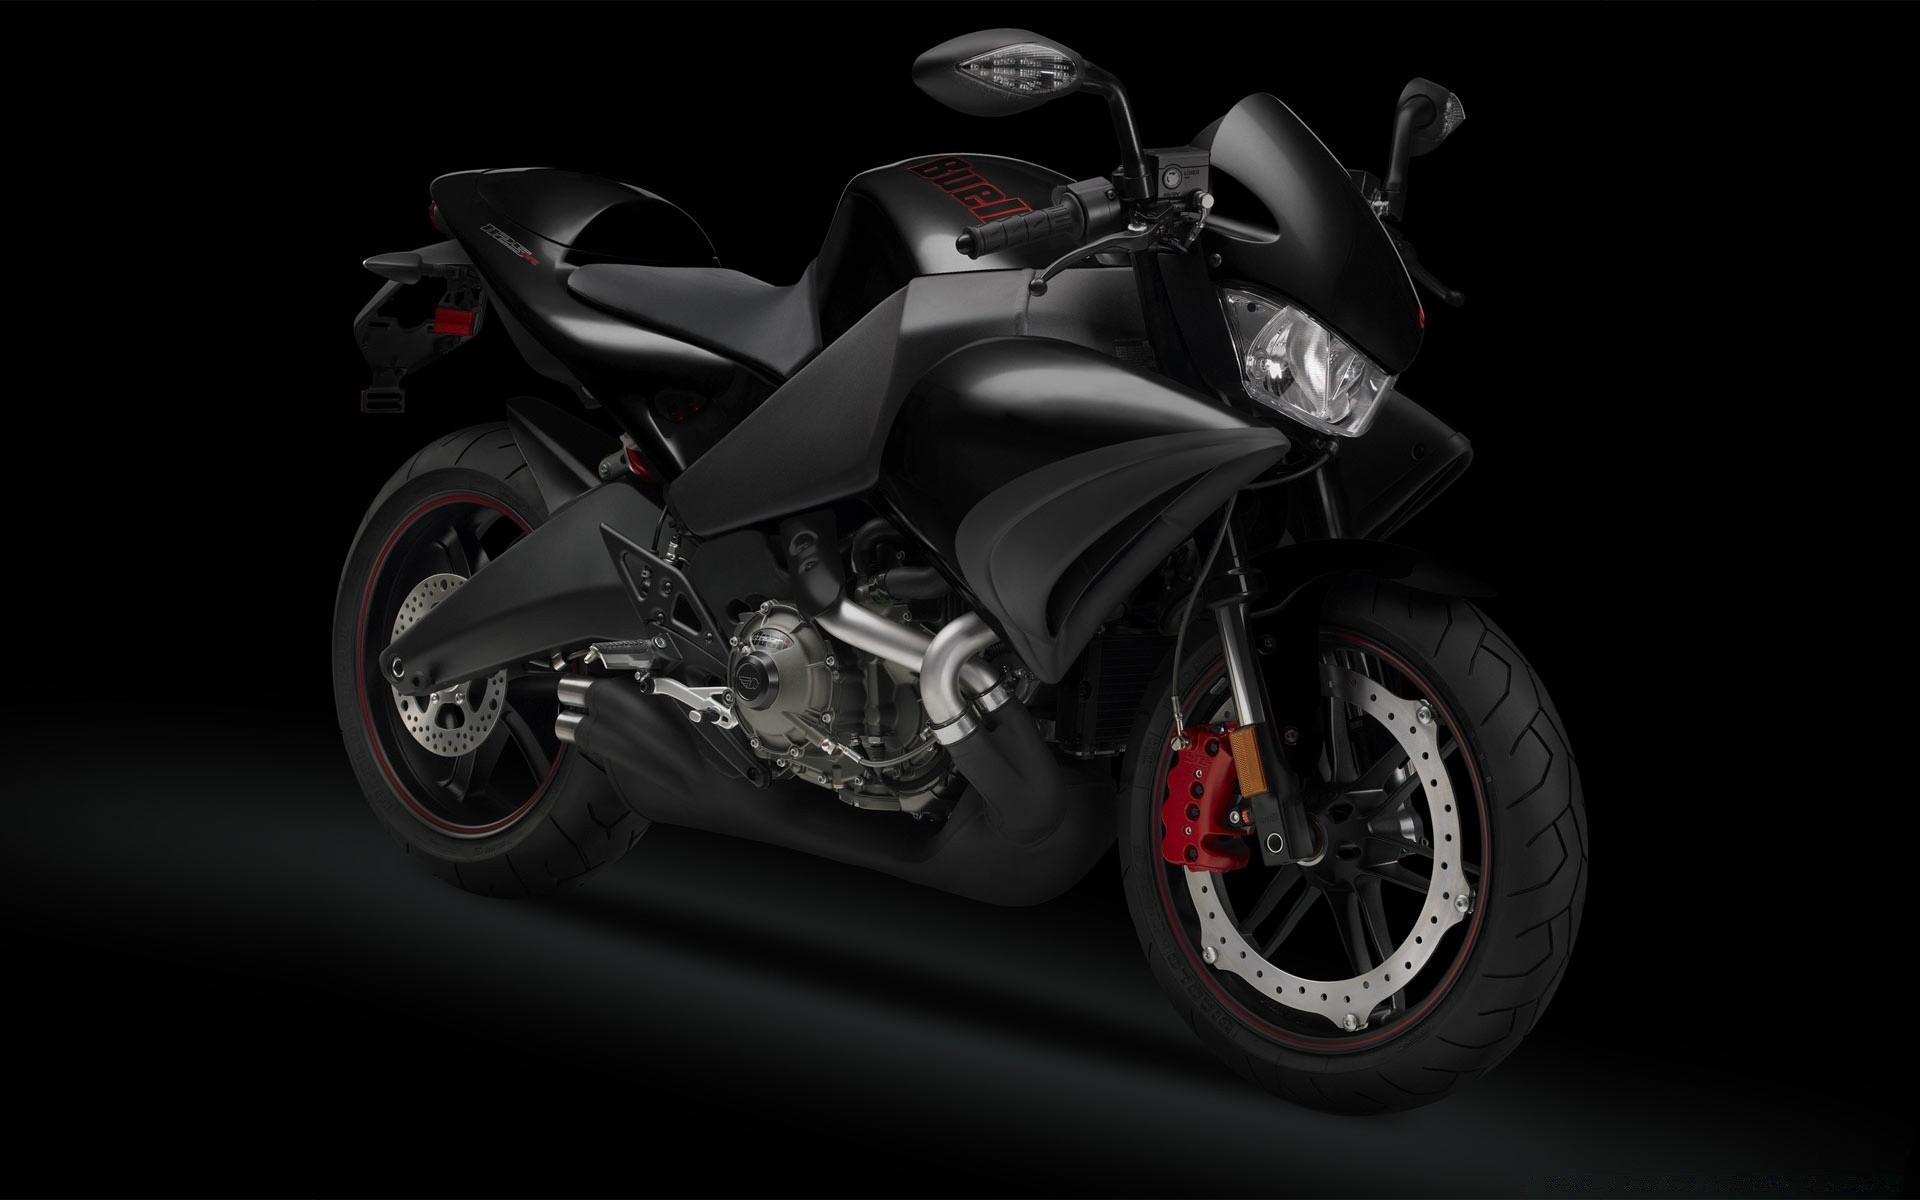 Картинки мотоциклы на мобильный телефон